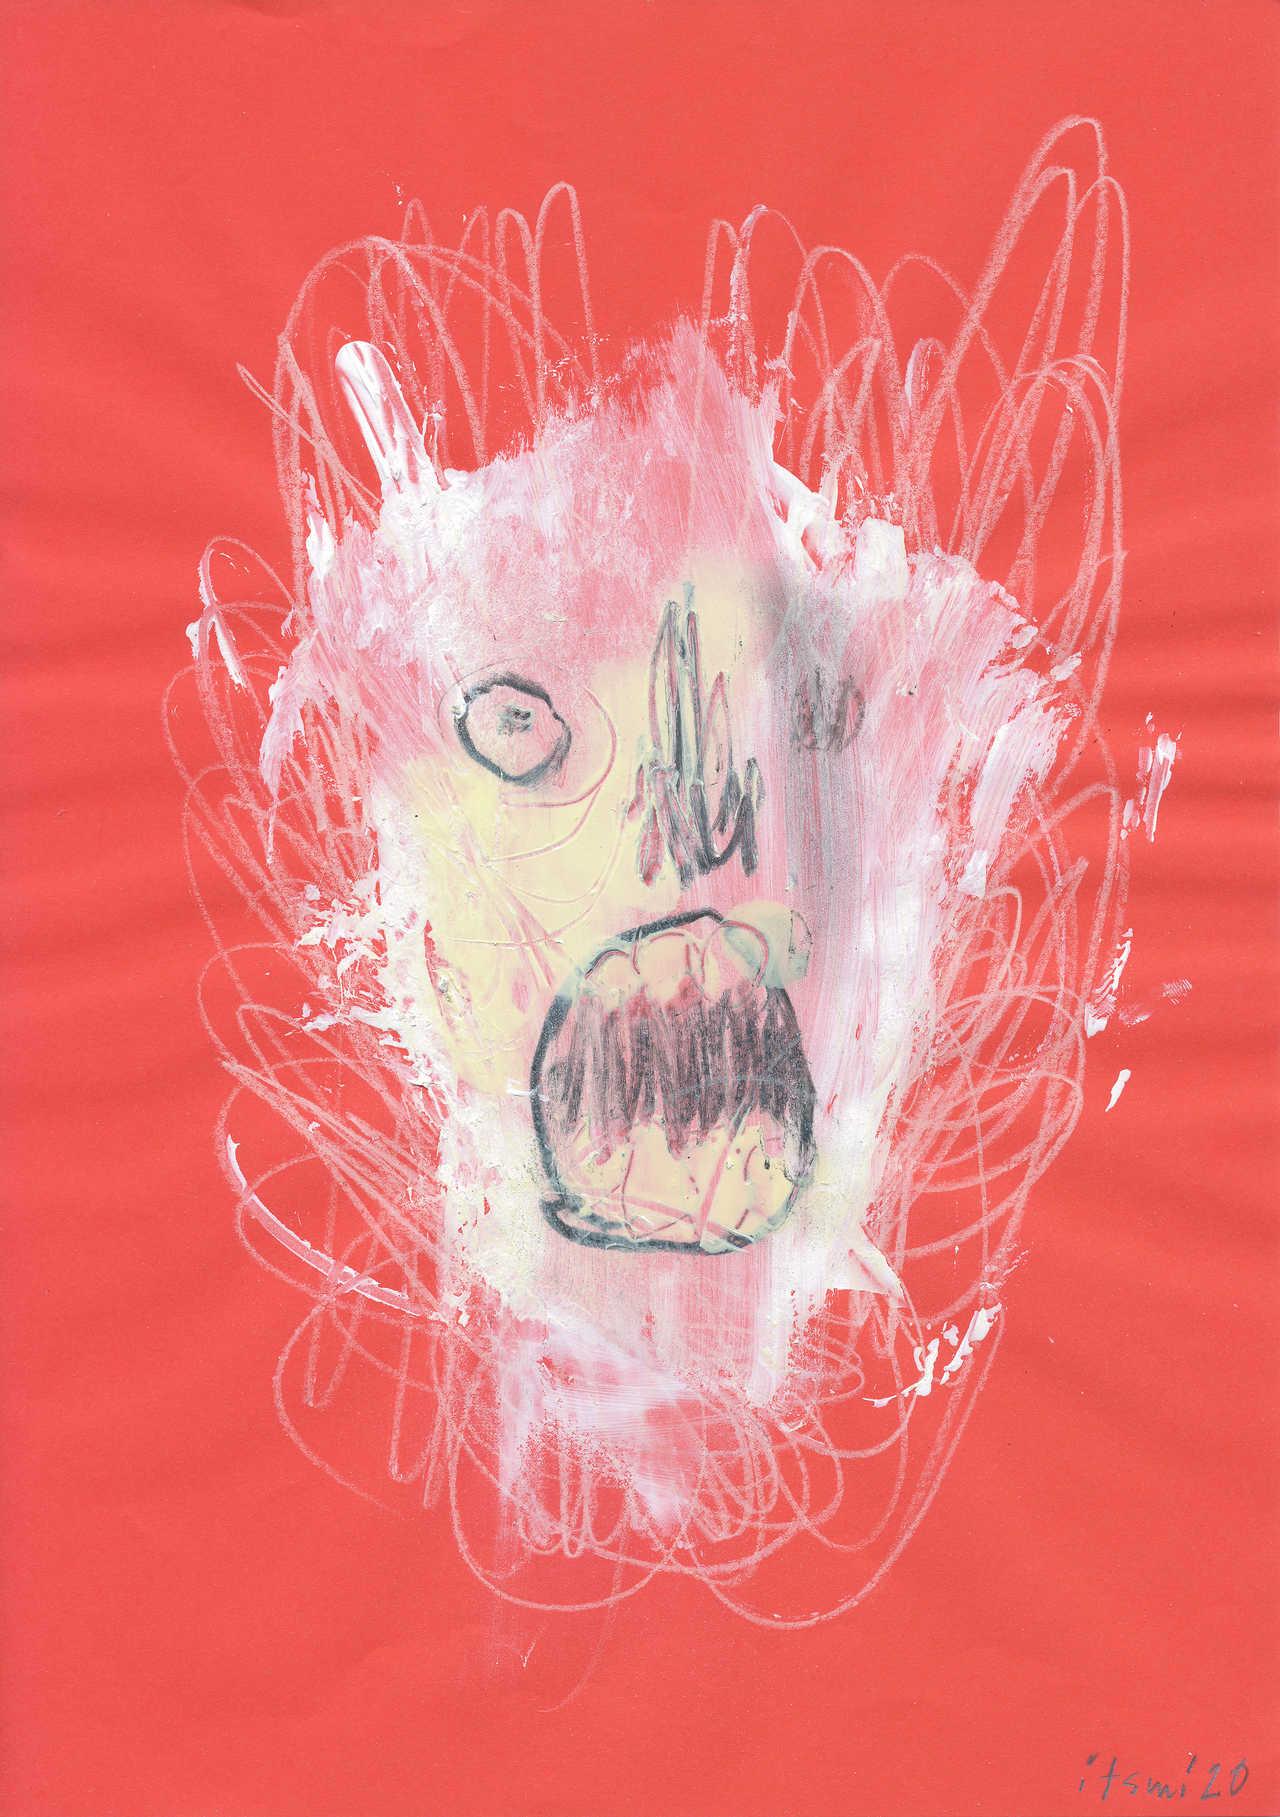 Quarantina II, 2020, ακρυλικό, spray, ξυλομπογιά και μολύβι σε χαρτί, 29,5Χ21 εκ.